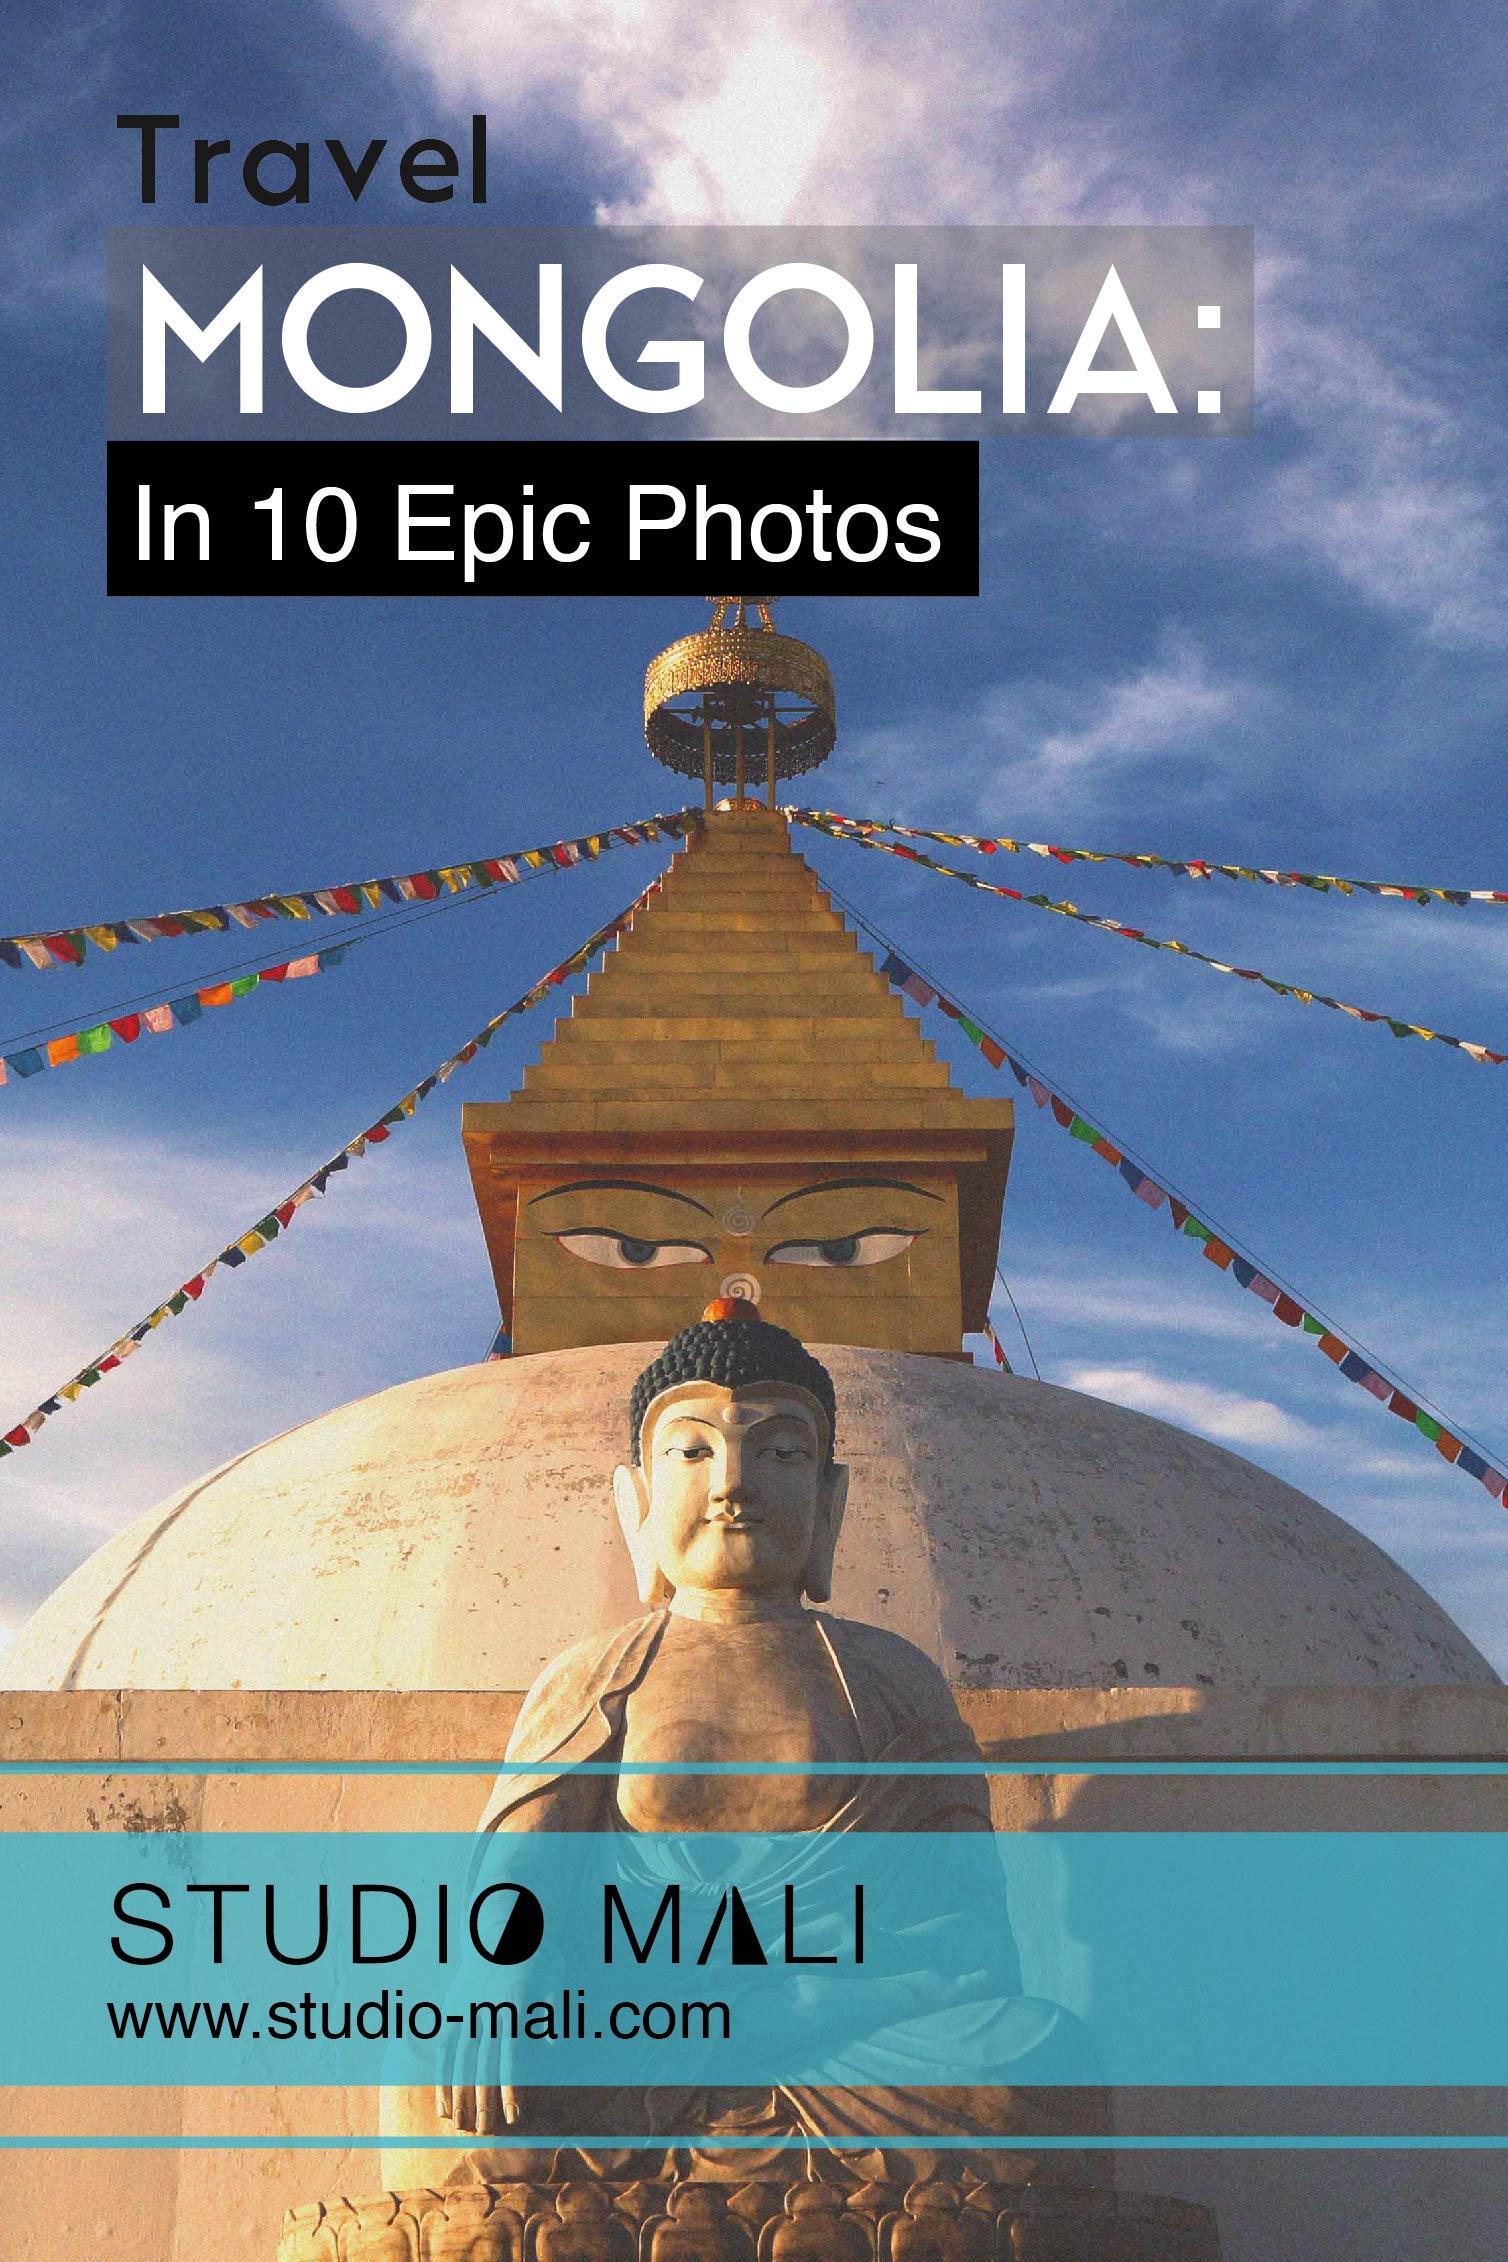 Mongolia - In 10 Epic Photos, by Studio Mali.jpg